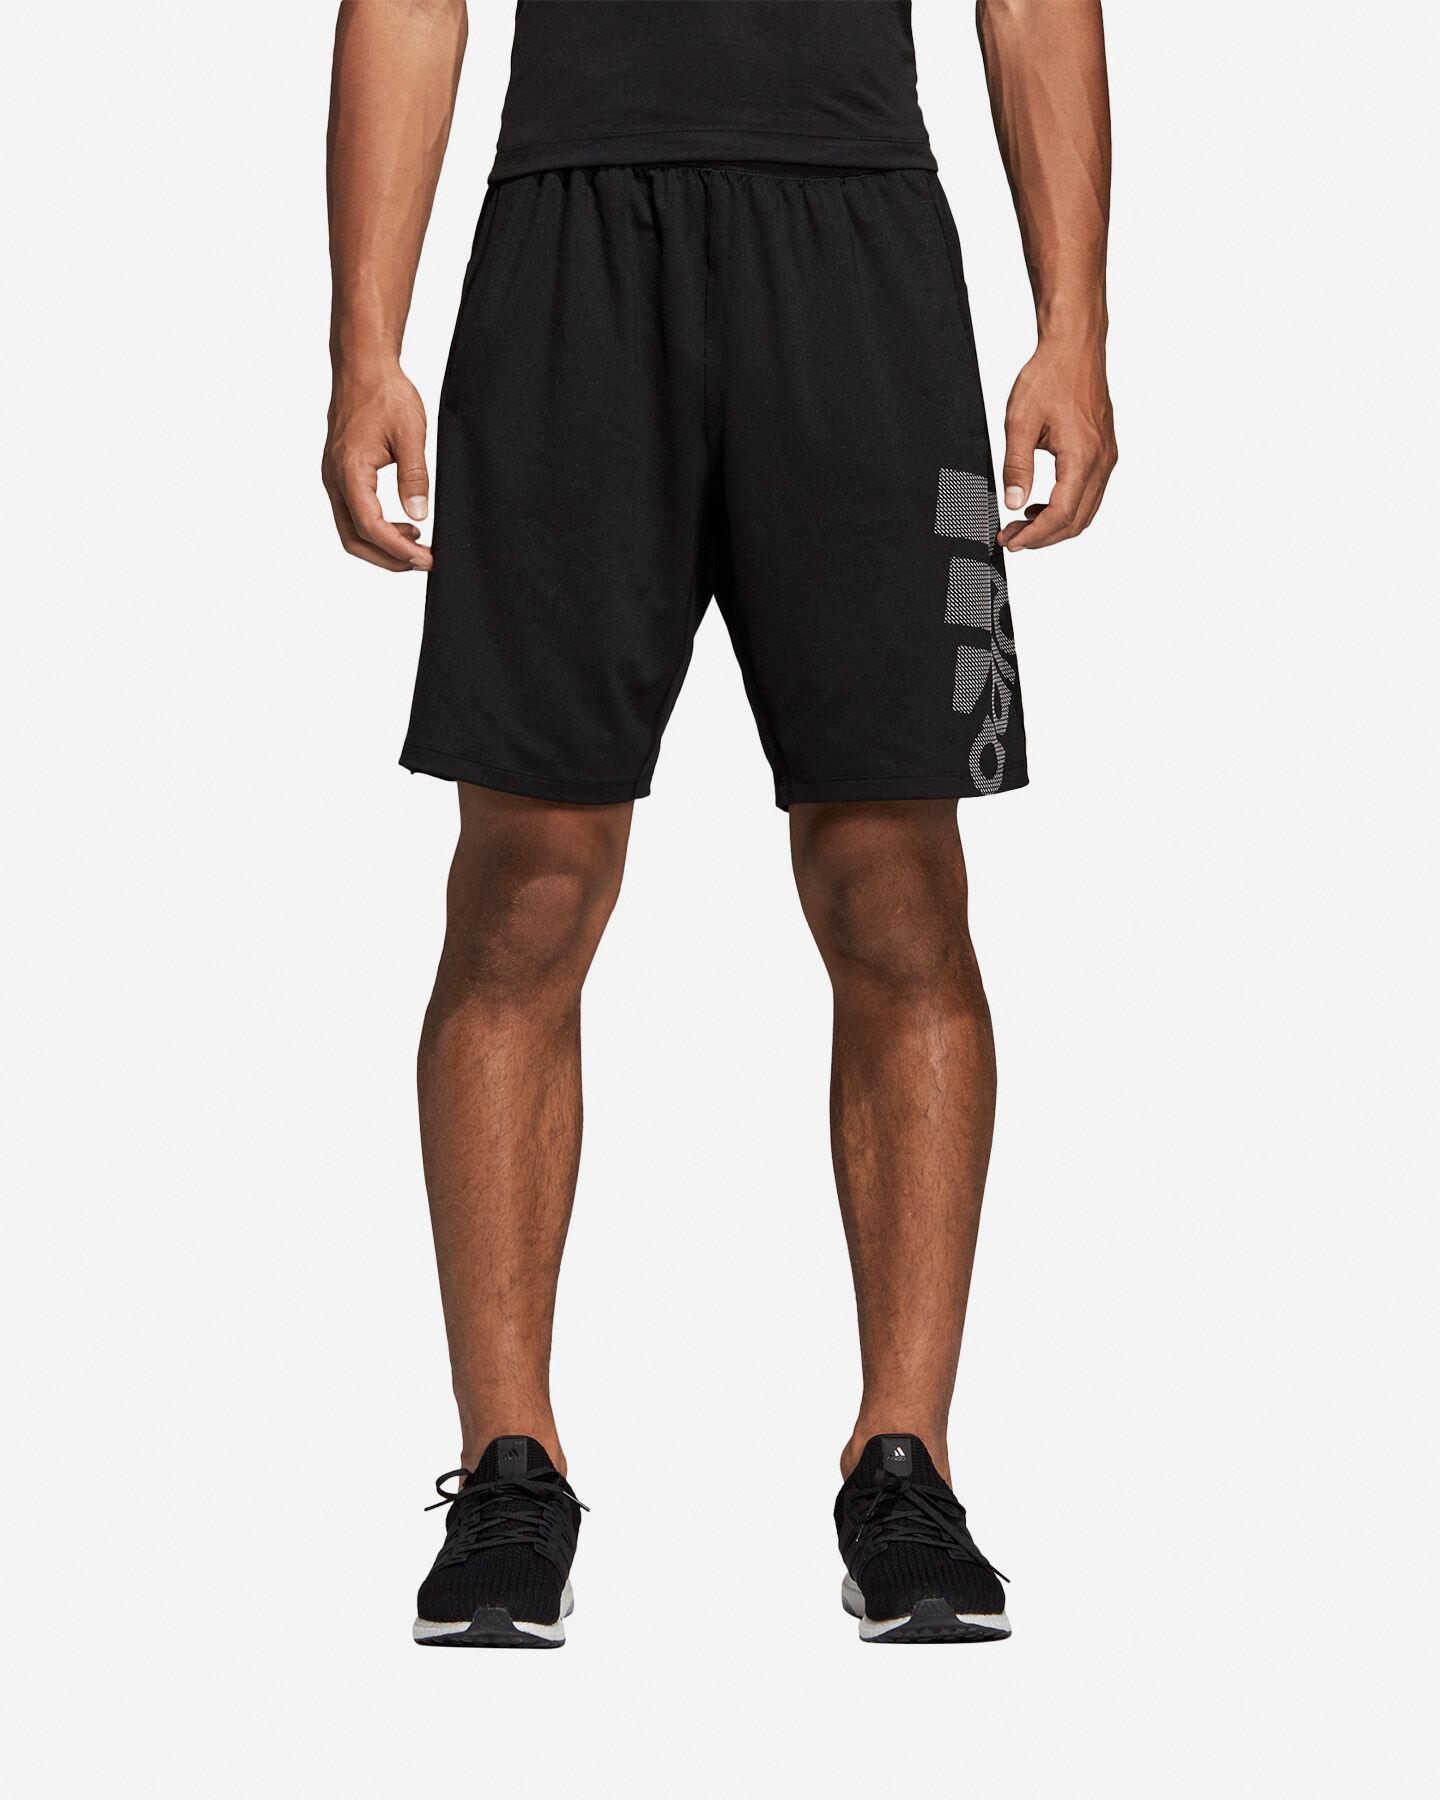 Pantalone training ADIDAS 4KRFT SPORT GRAPHIC BADGE OF SPORT M S2020483 scatto 2